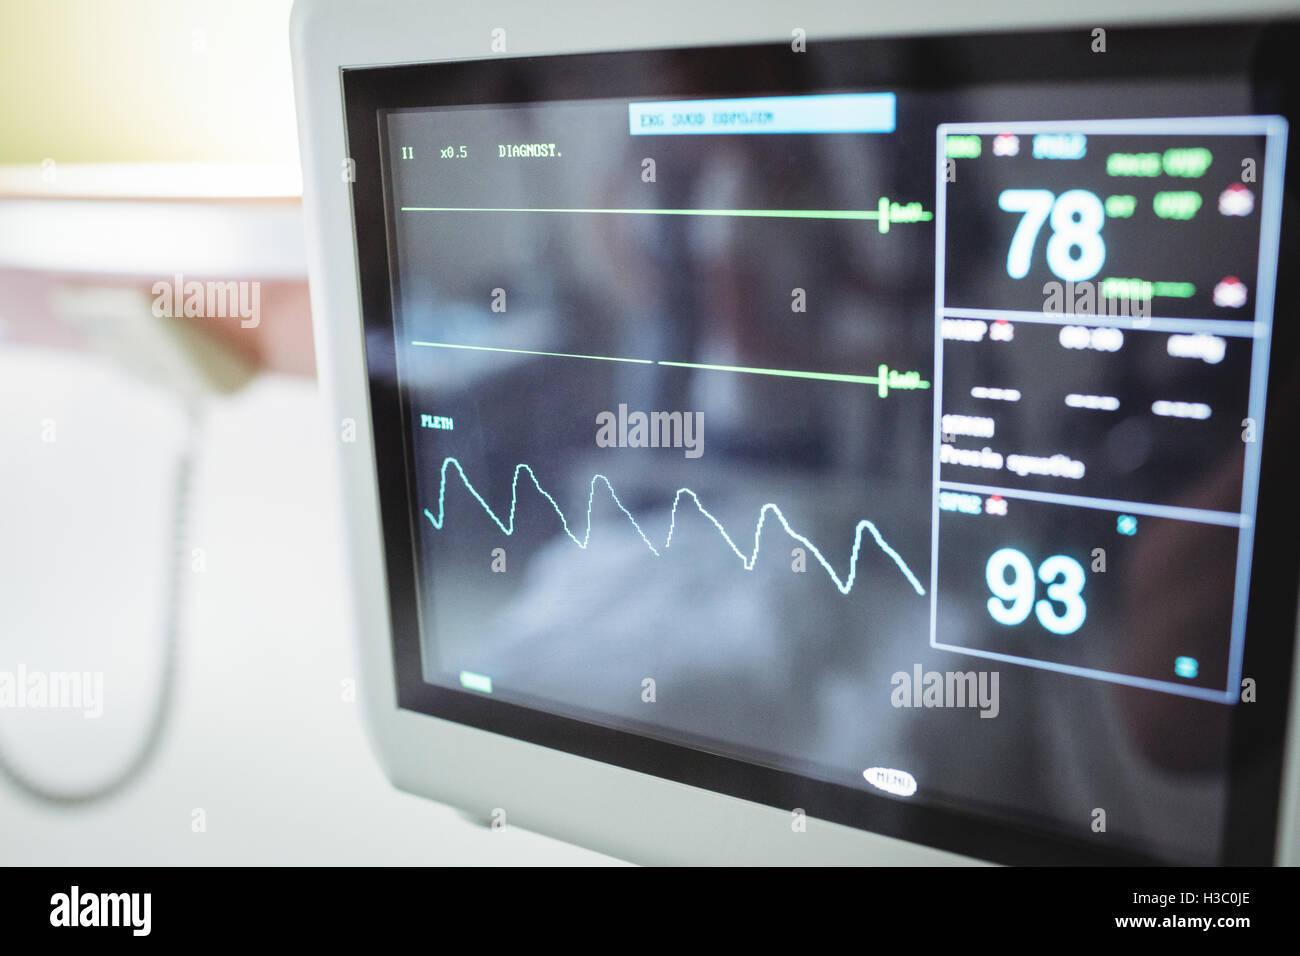 Close-up of vital signs monitor - Stock Image